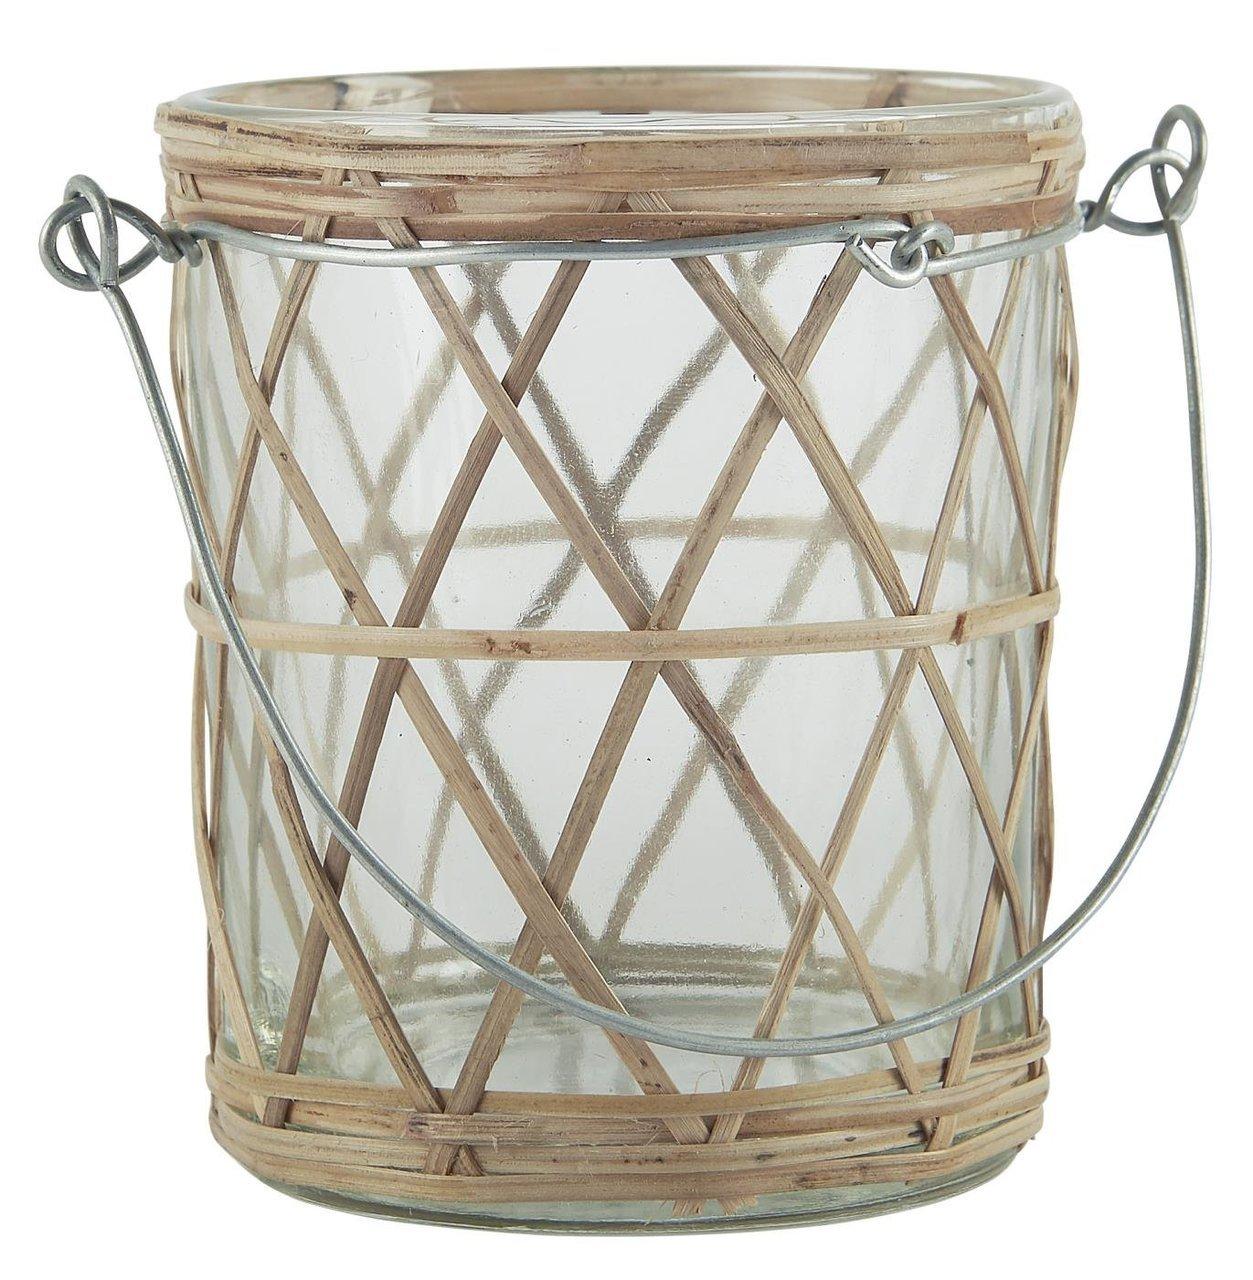 Ib Laursen Teelichthalter Metallhenkel Bambusgeflecht